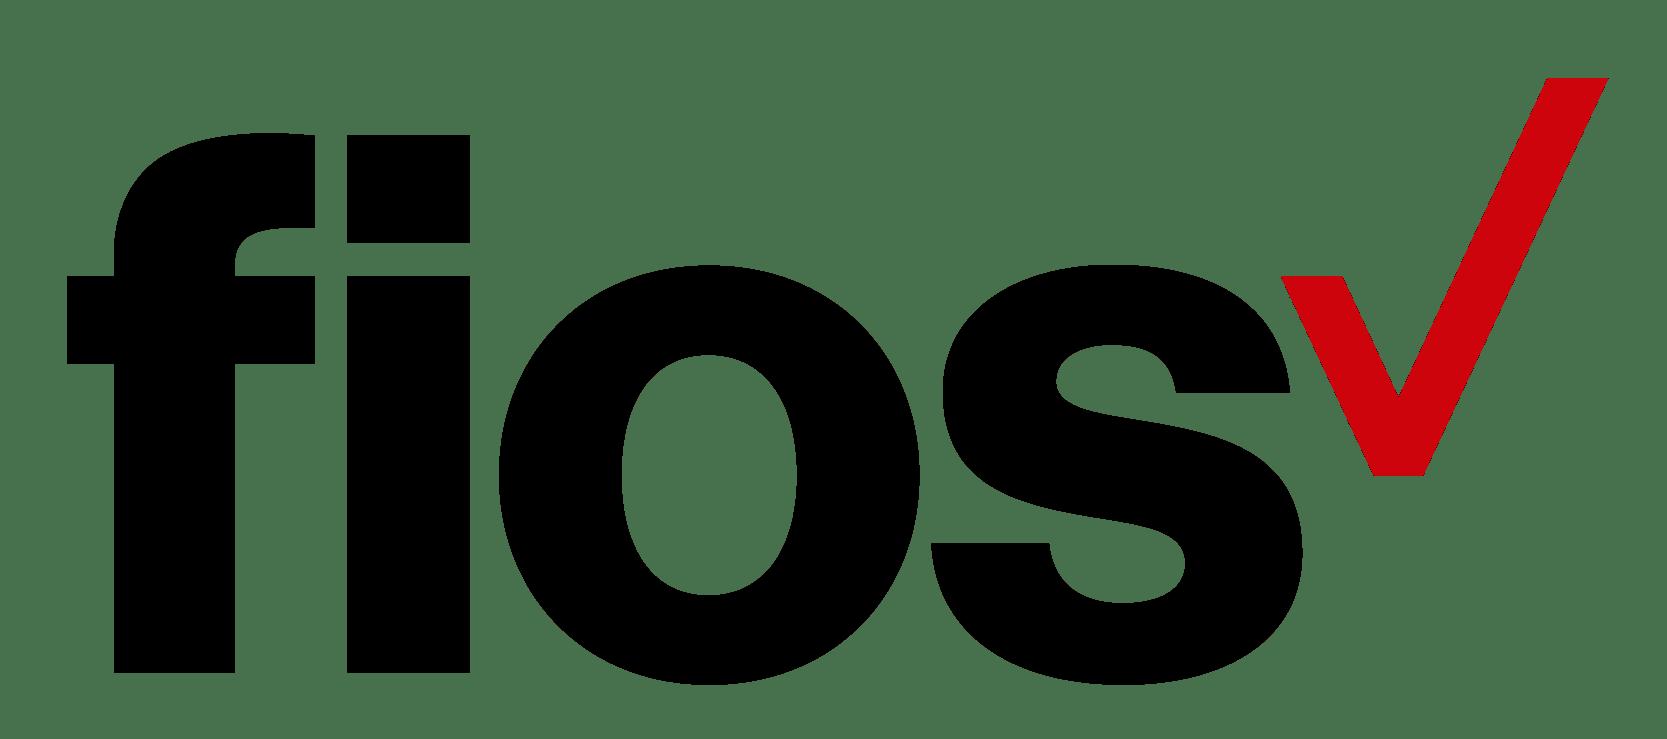 Verizon Fios Gigabit Connection w/ TV for $75 per month ...